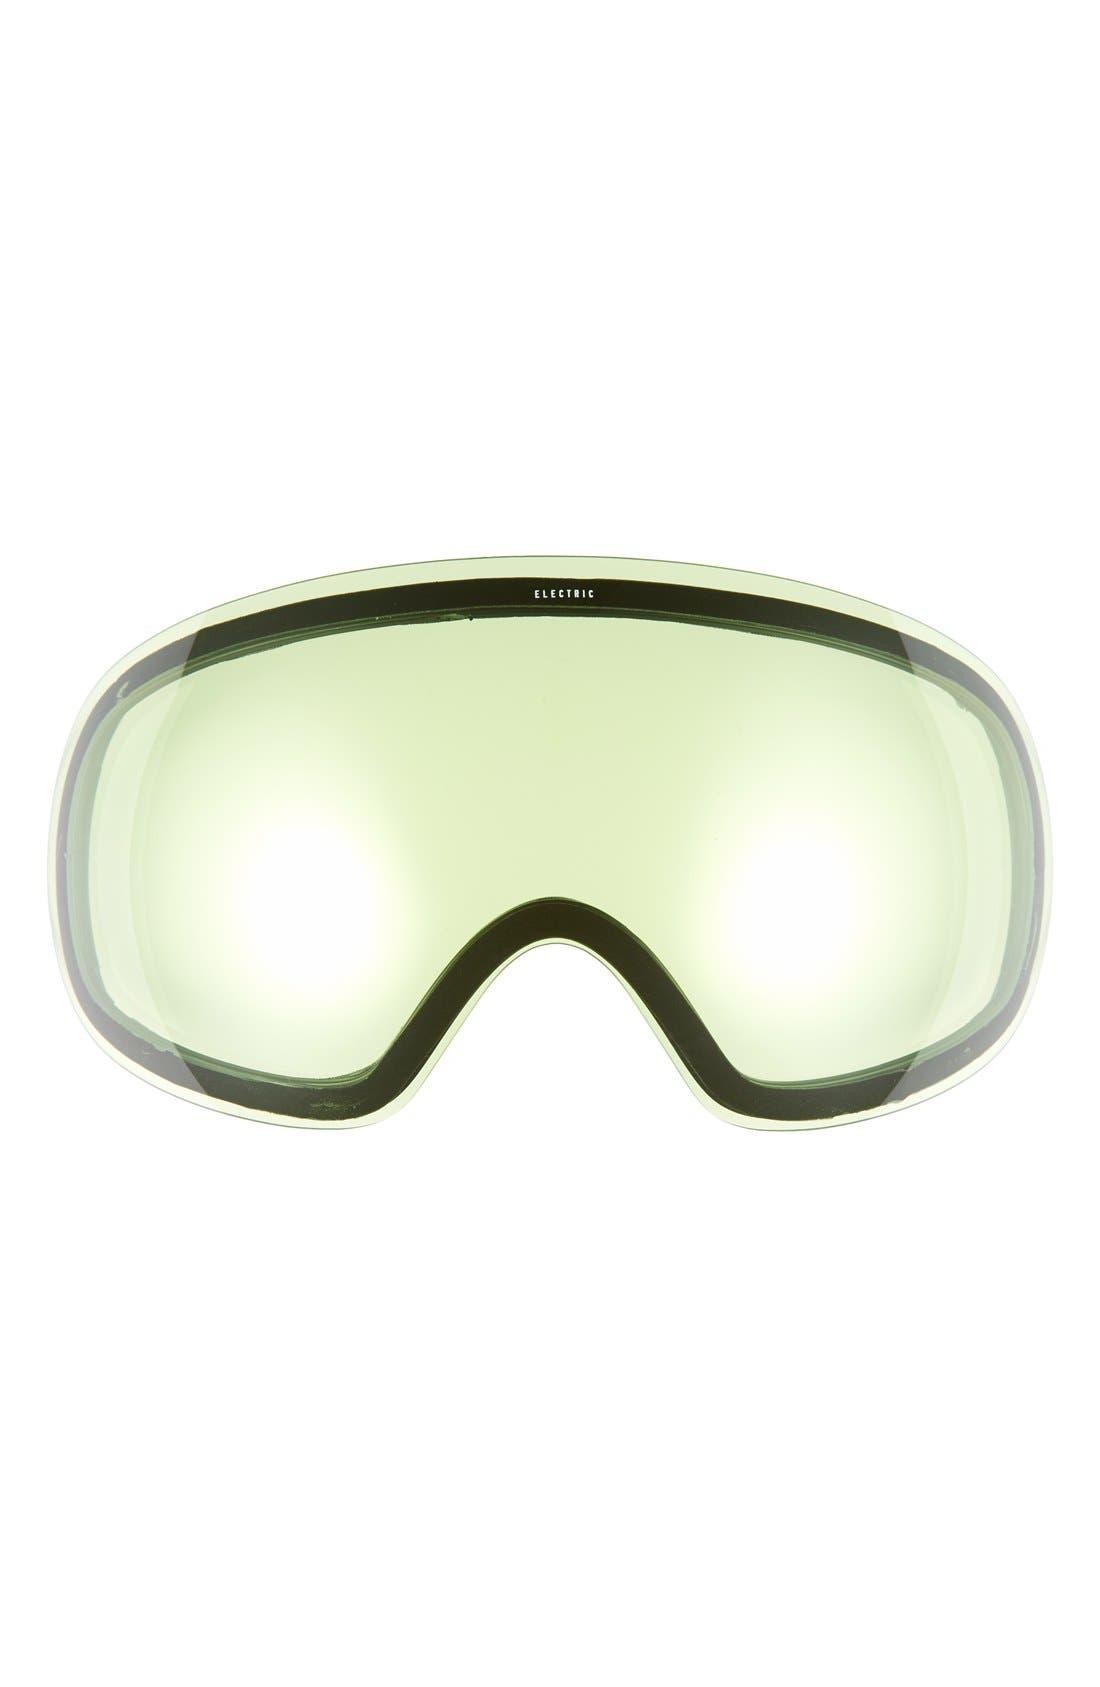 EG3 254mm Snow Goggles,                             Alternate thumbnail 25, color,